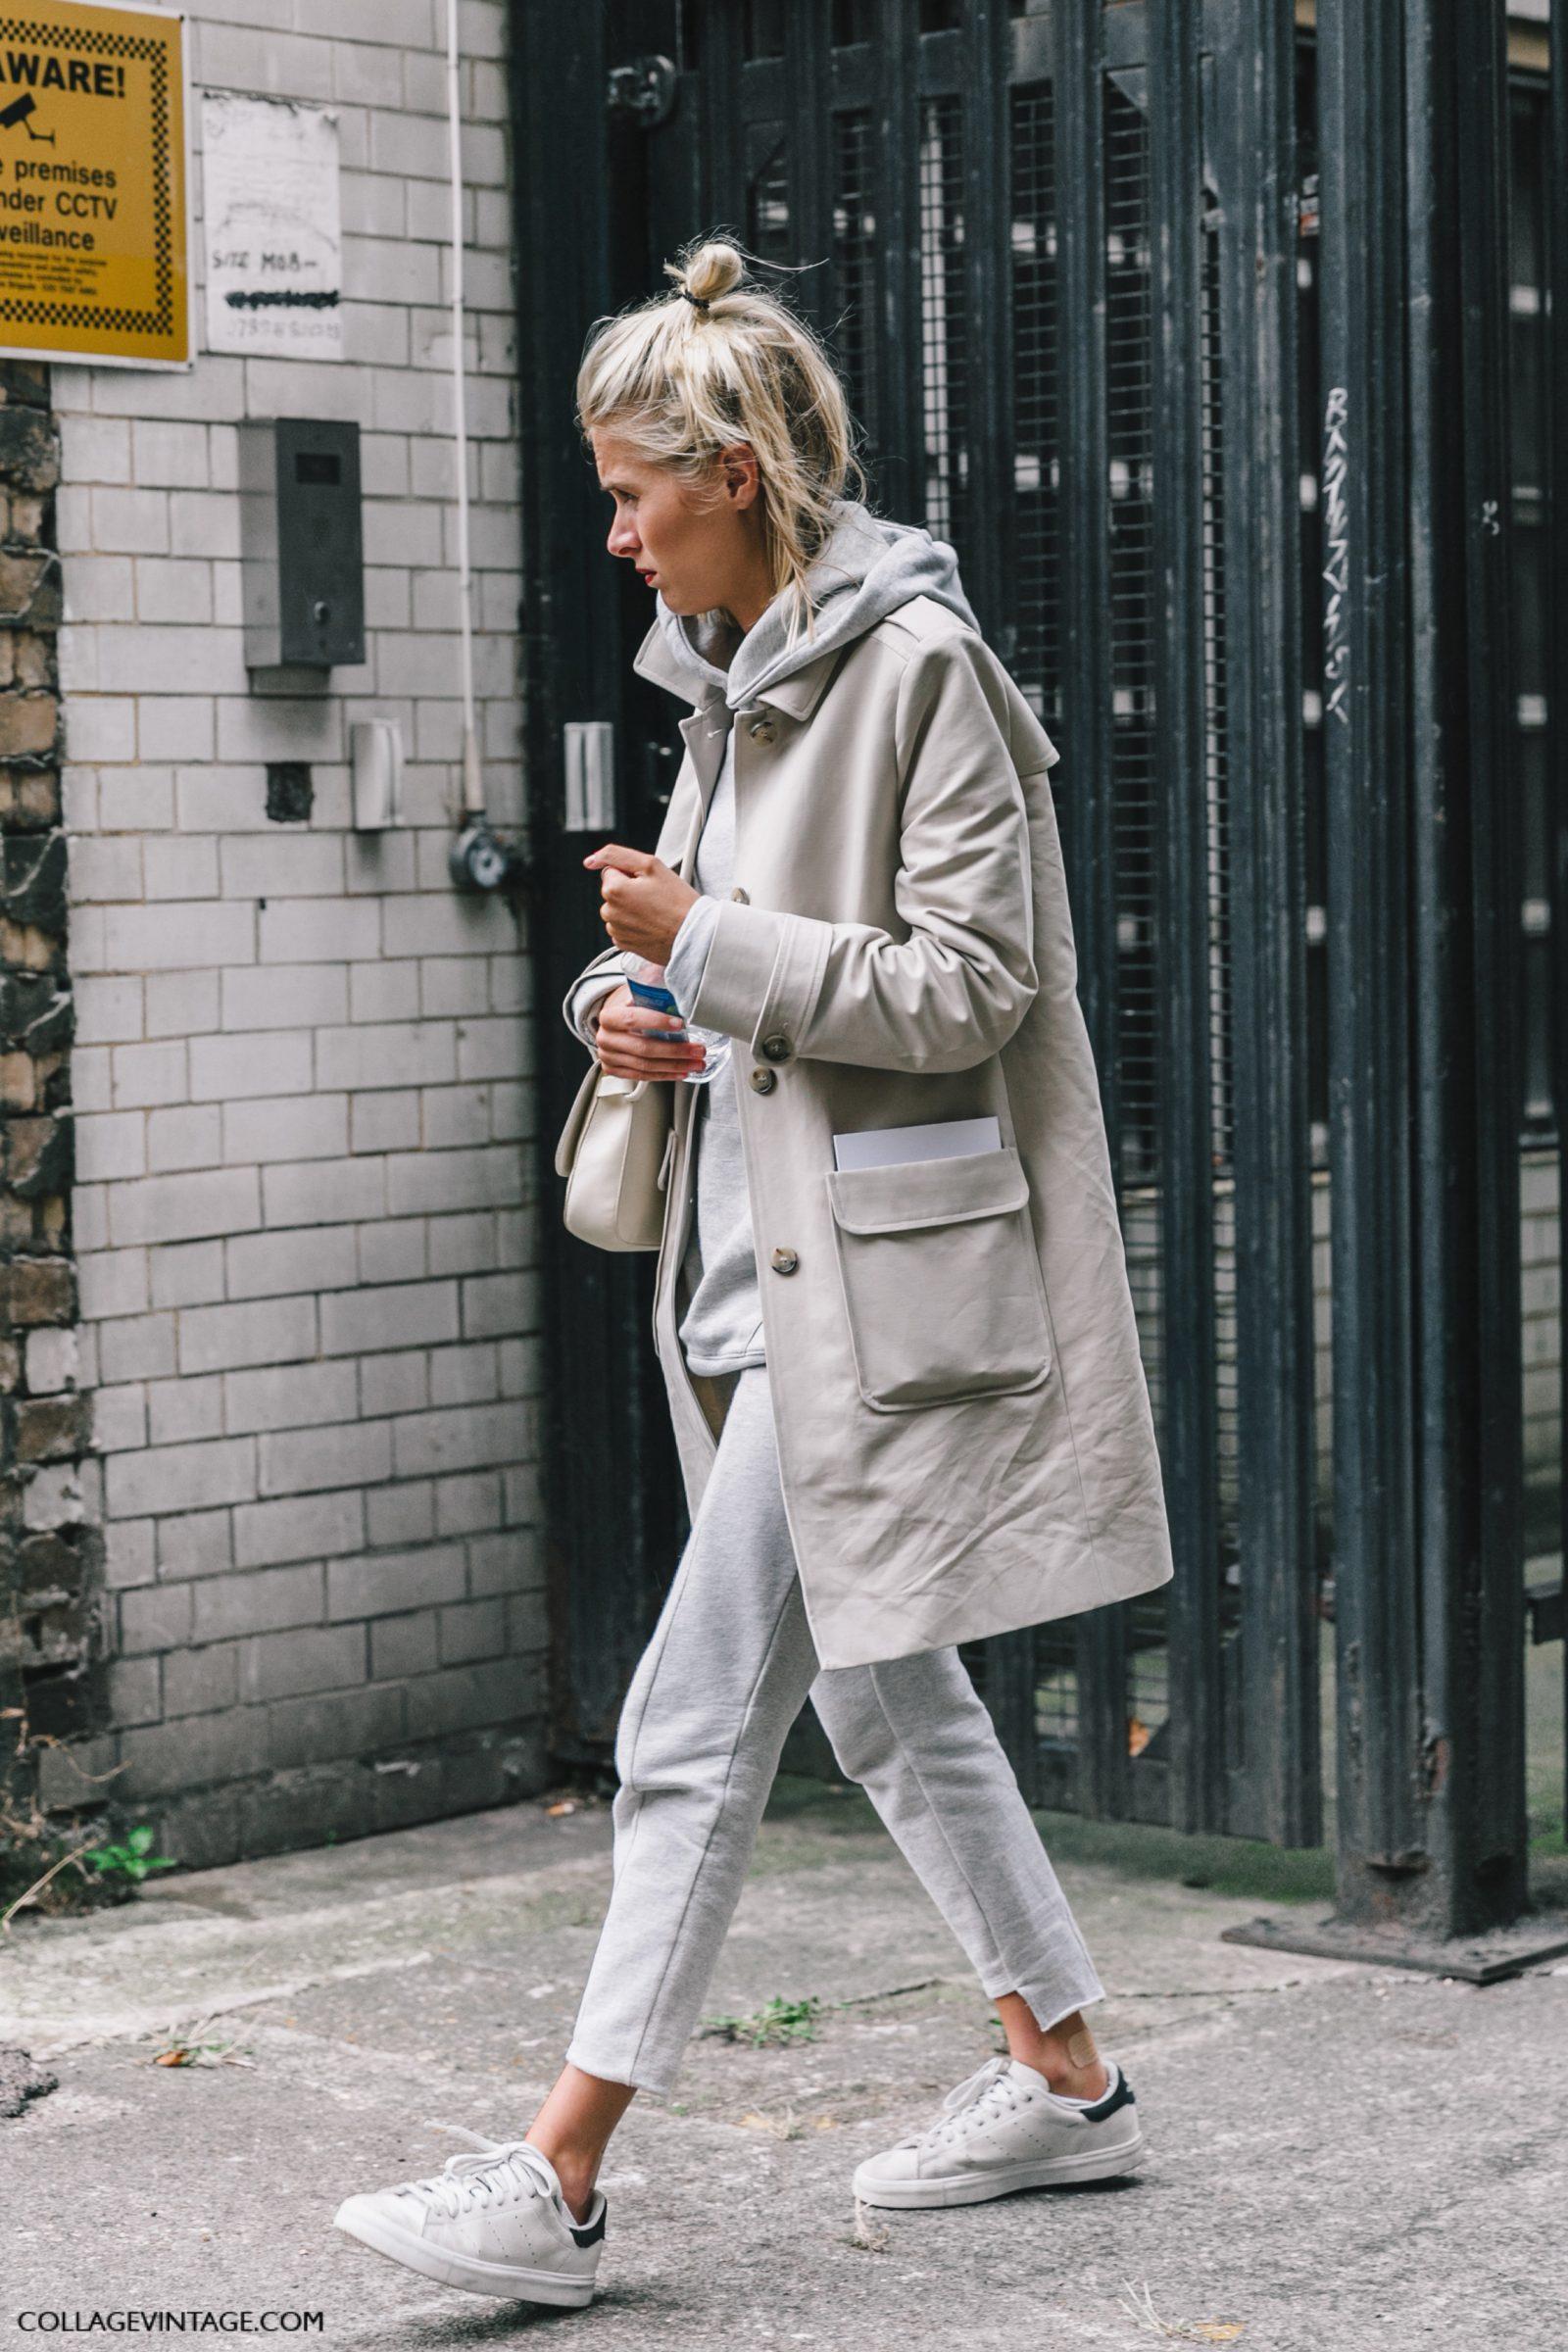 lfw-london_fashion_week_ss17-street_style-outfits-collage_vintage-vintage-roksanda-christopher_kane-joseph-198